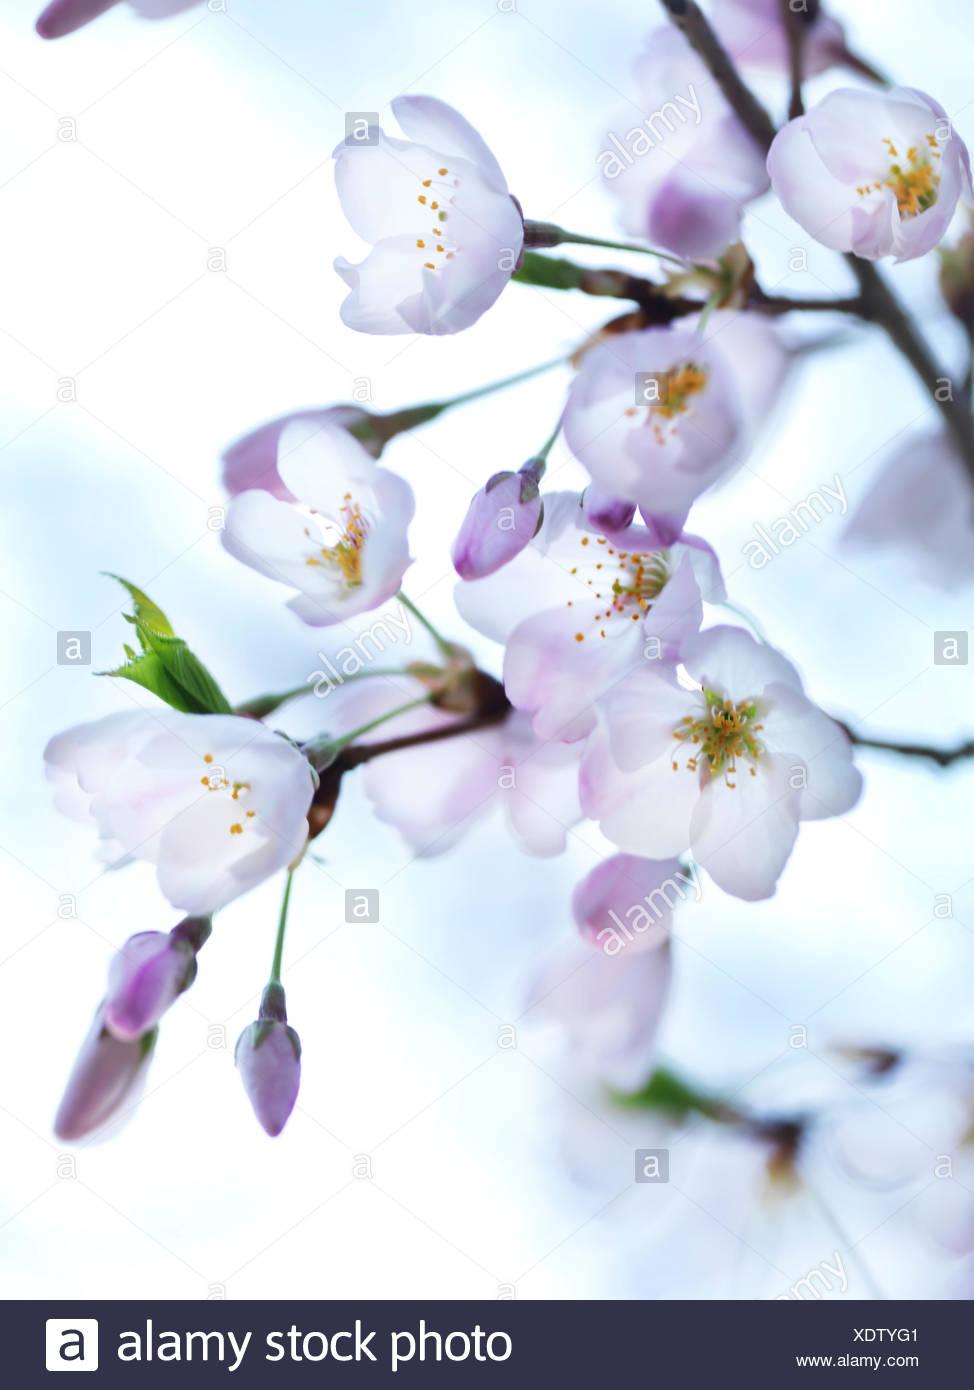 Japanese Sakura cherry blossoms, close-up - Stock Image